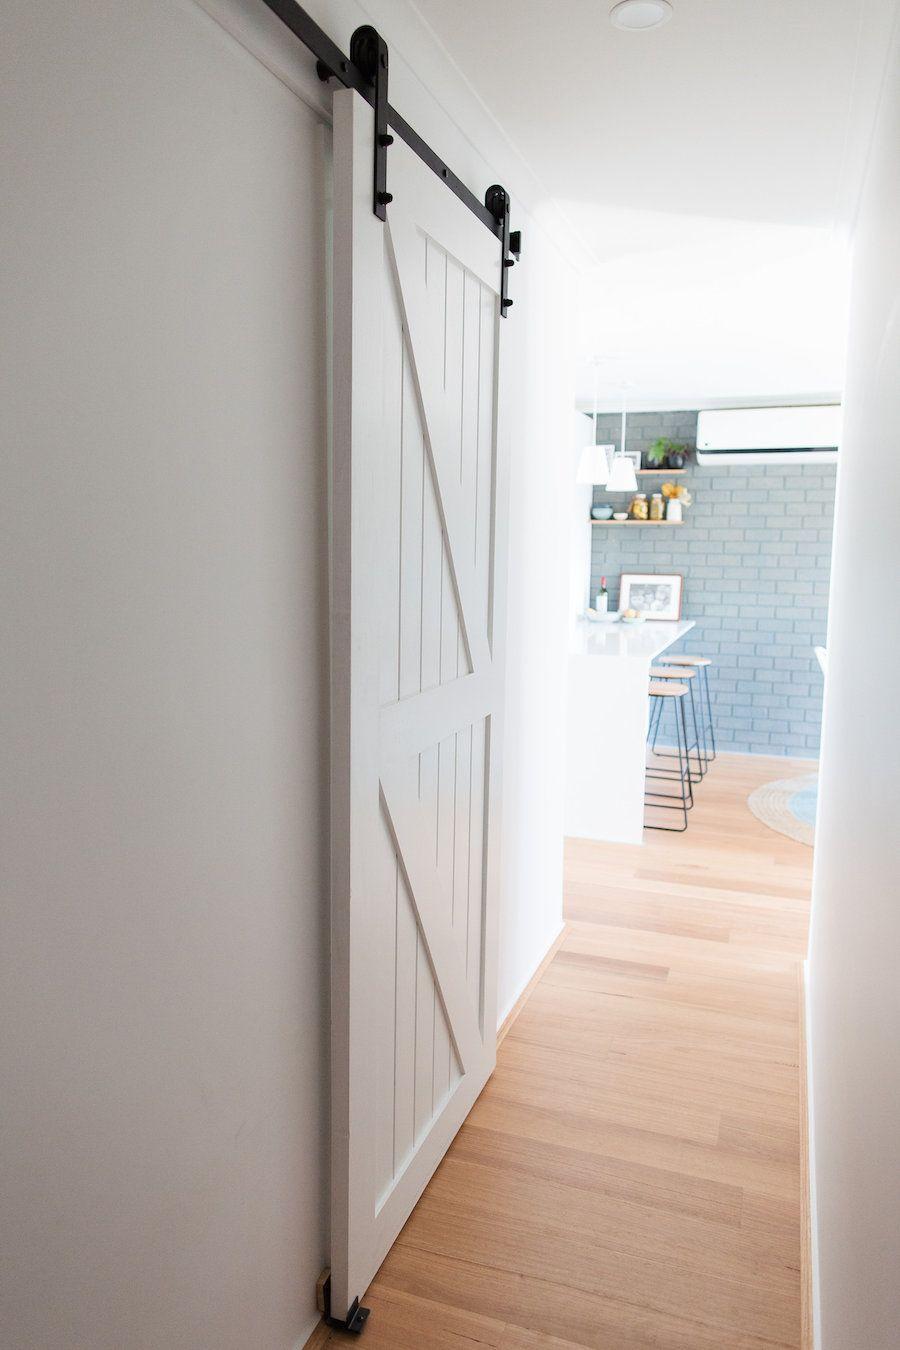 How To Install A Barn Door 10 Easy Steps To Install Your Own Barn Door Style Curator Barn Door Installation Interior Barn Doors Home Renovation